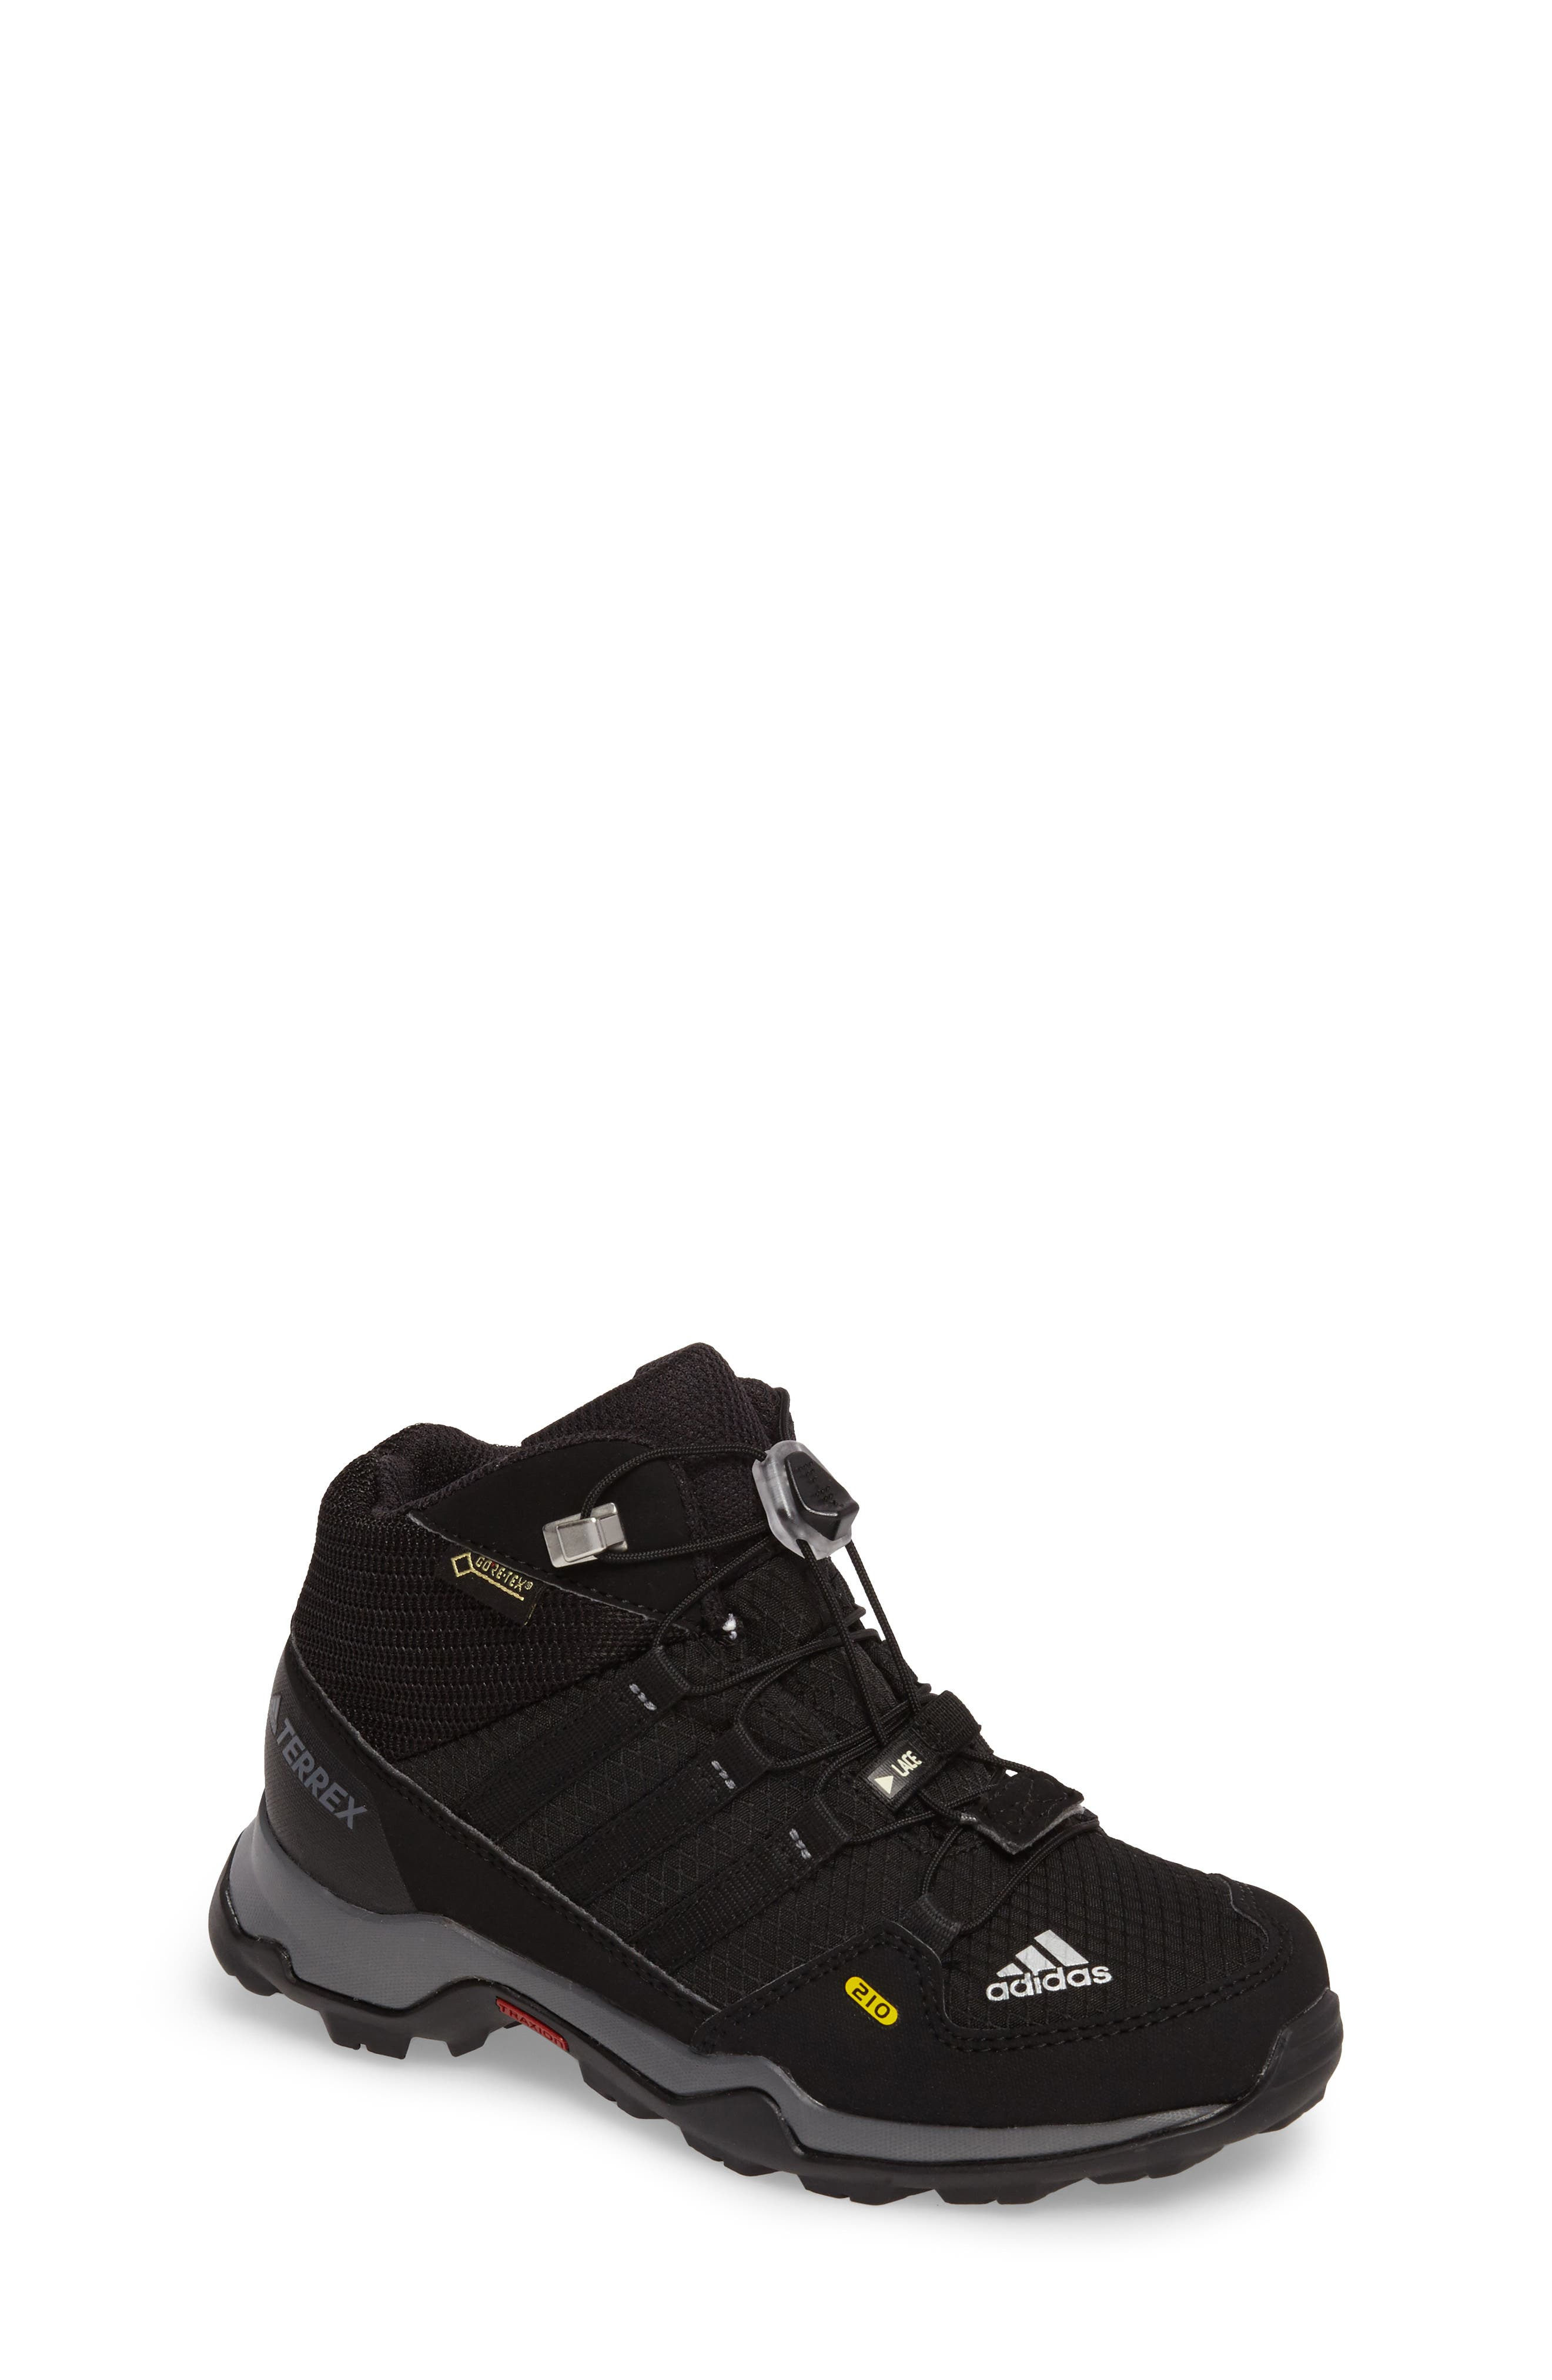 Terrex Mid Gore-Tex<sup>®</sup> Insulated Waterproof Sneaker Boot,                             Main thumbnail 1, color,                             Black/ Black/ Vista Grey